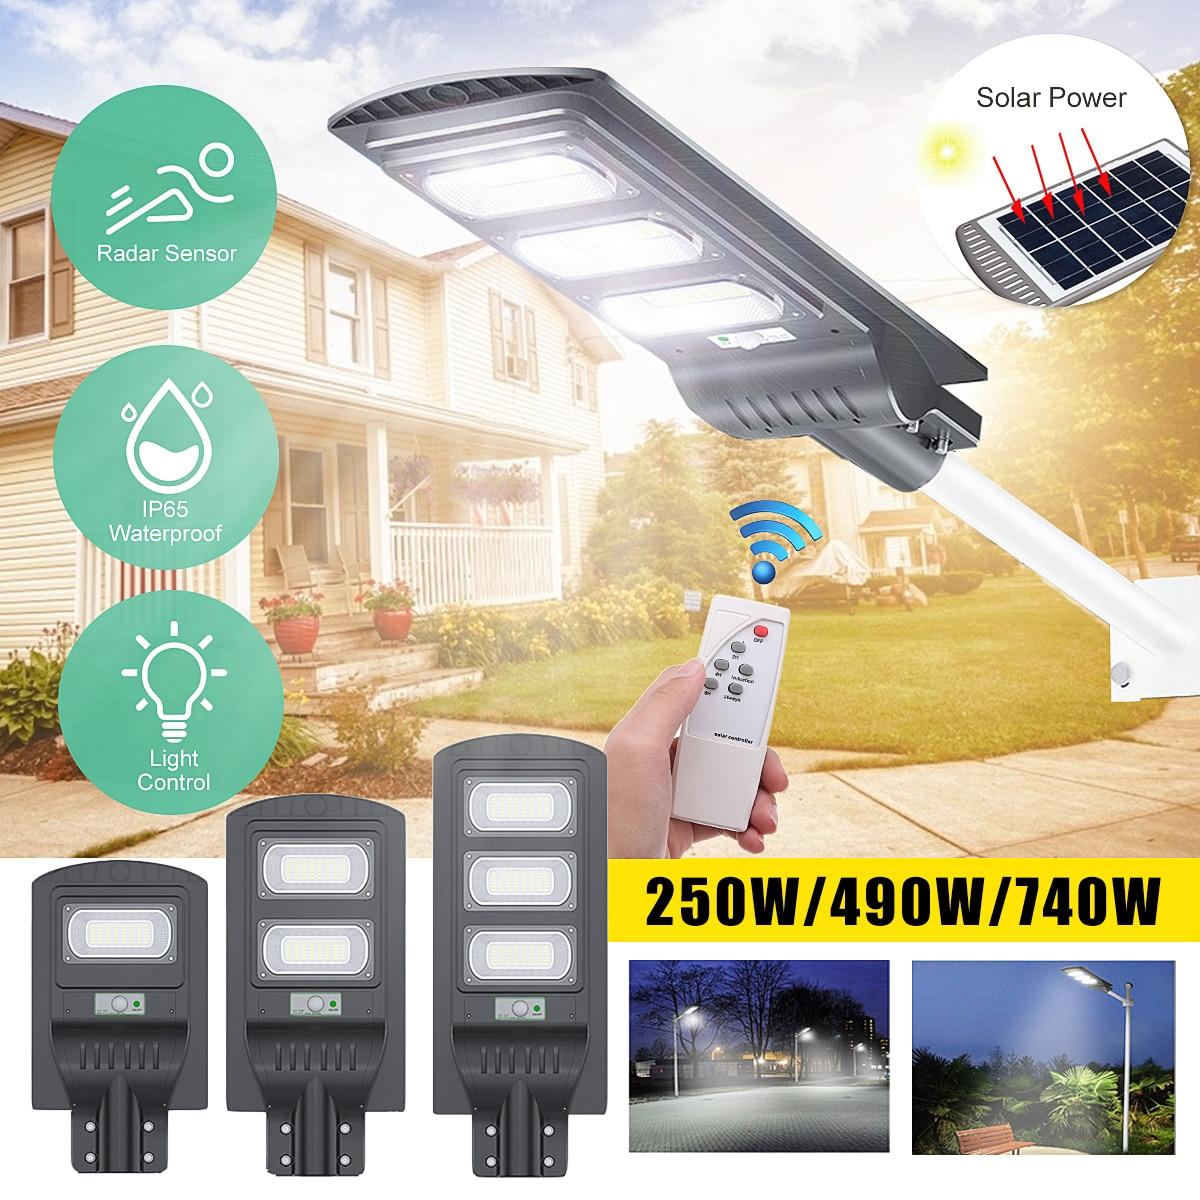 Smuxi 250W/490W/680W LED Gray IP65 Solar Street Light Radar Motion Constantly Bright Induction Solar Sensor Remote Control